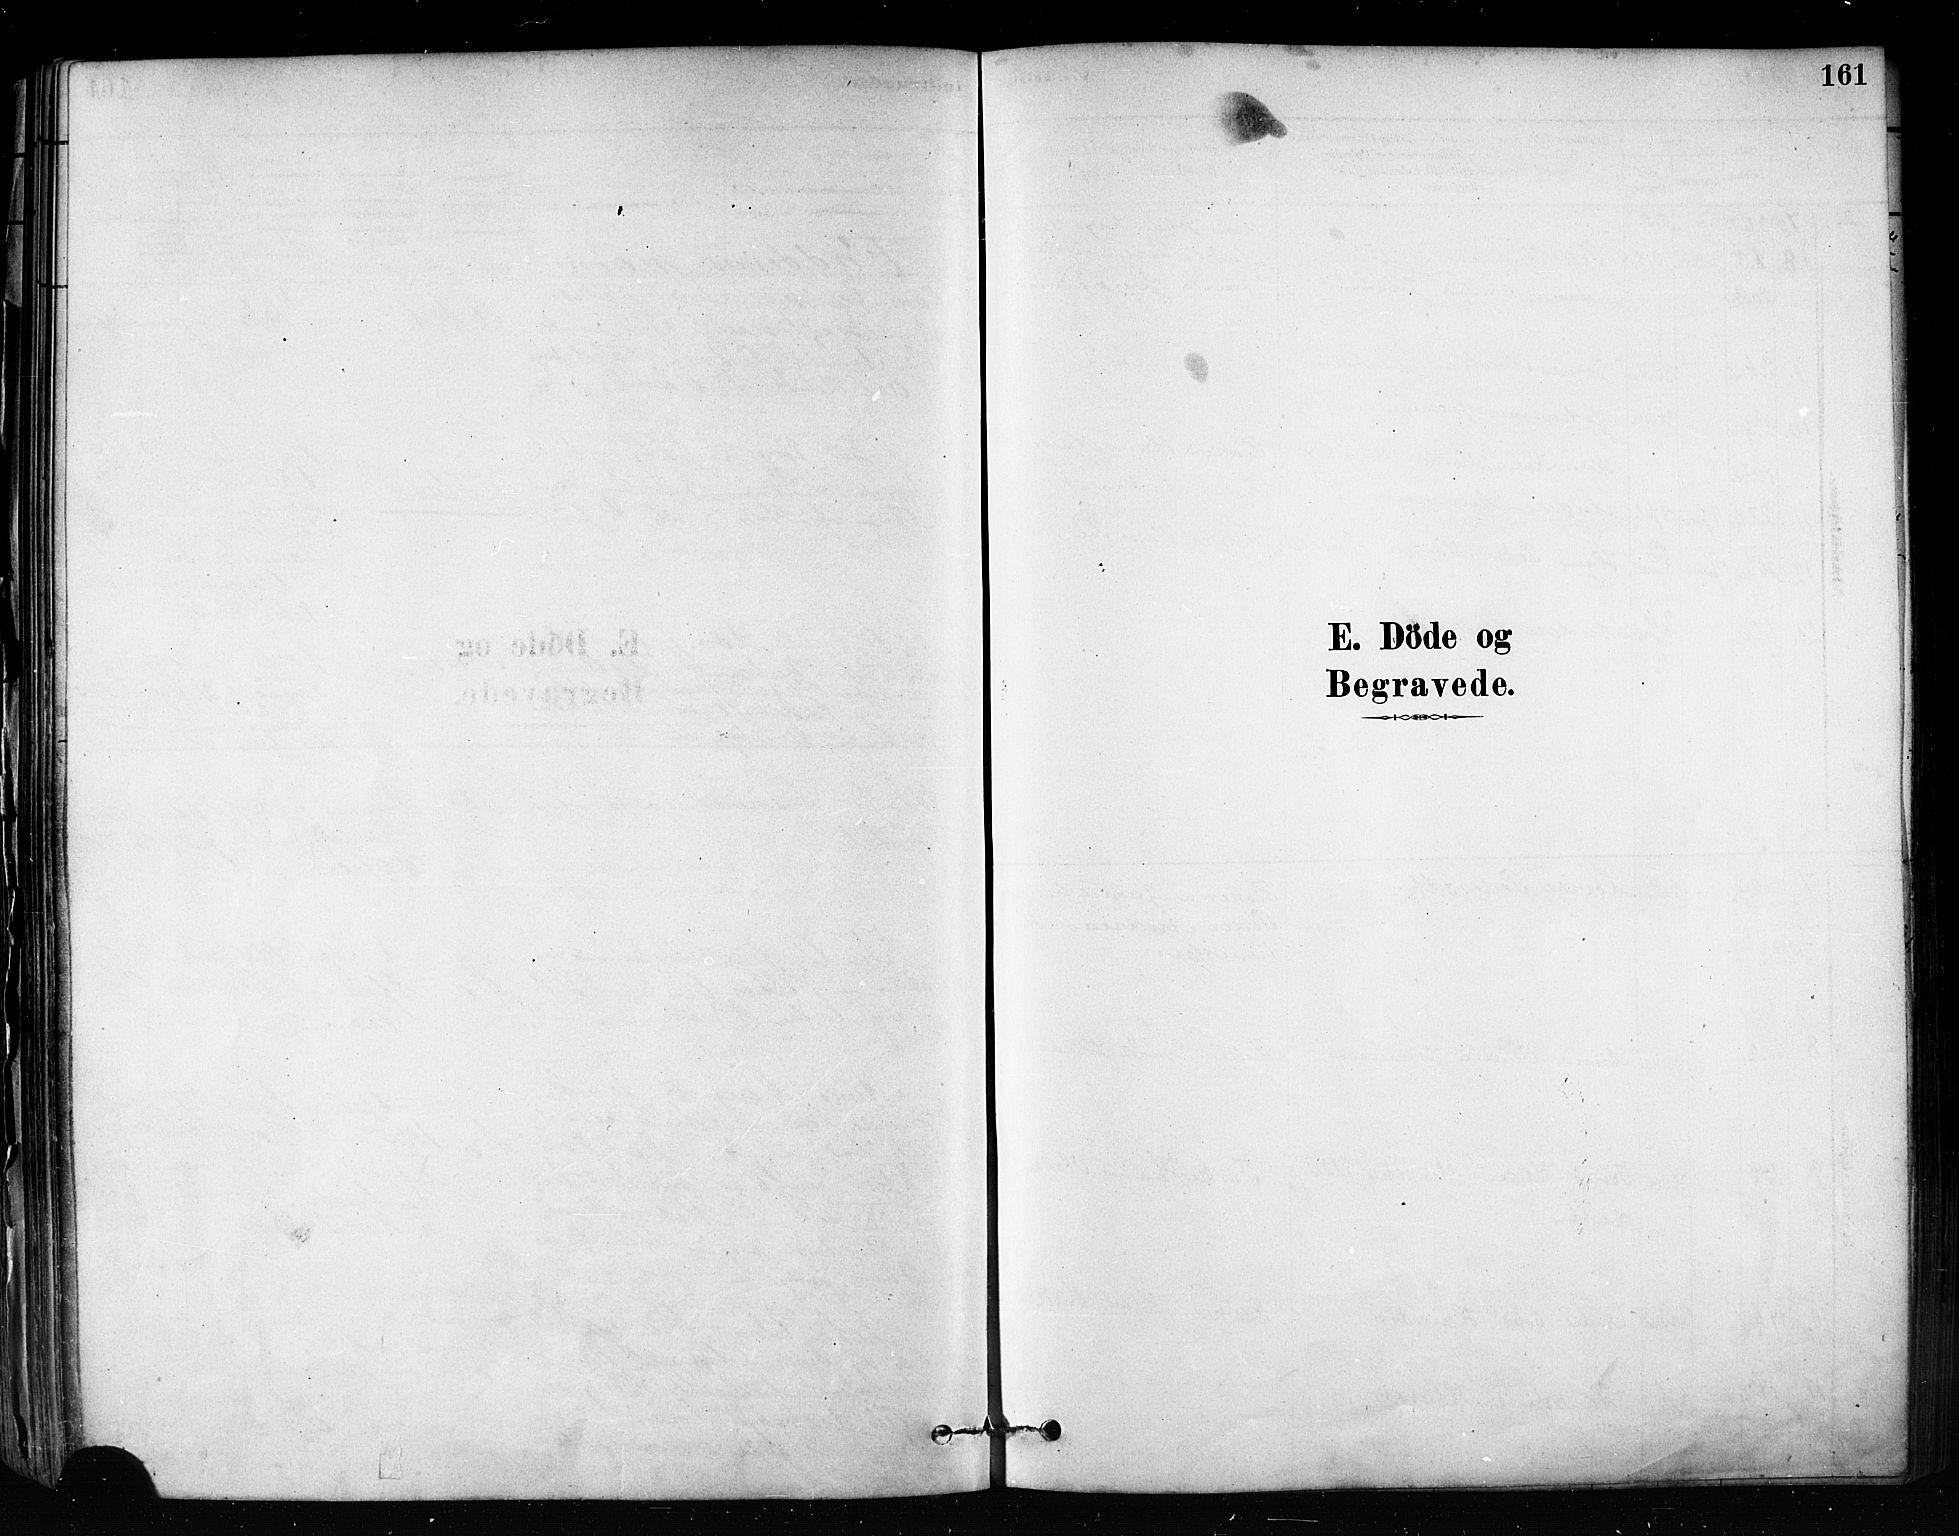 SATØ, Talvik sokneprestkontor, H/Ha/L0012kirke: Ministerialbok nr. 12, 1878-1886, s. 161